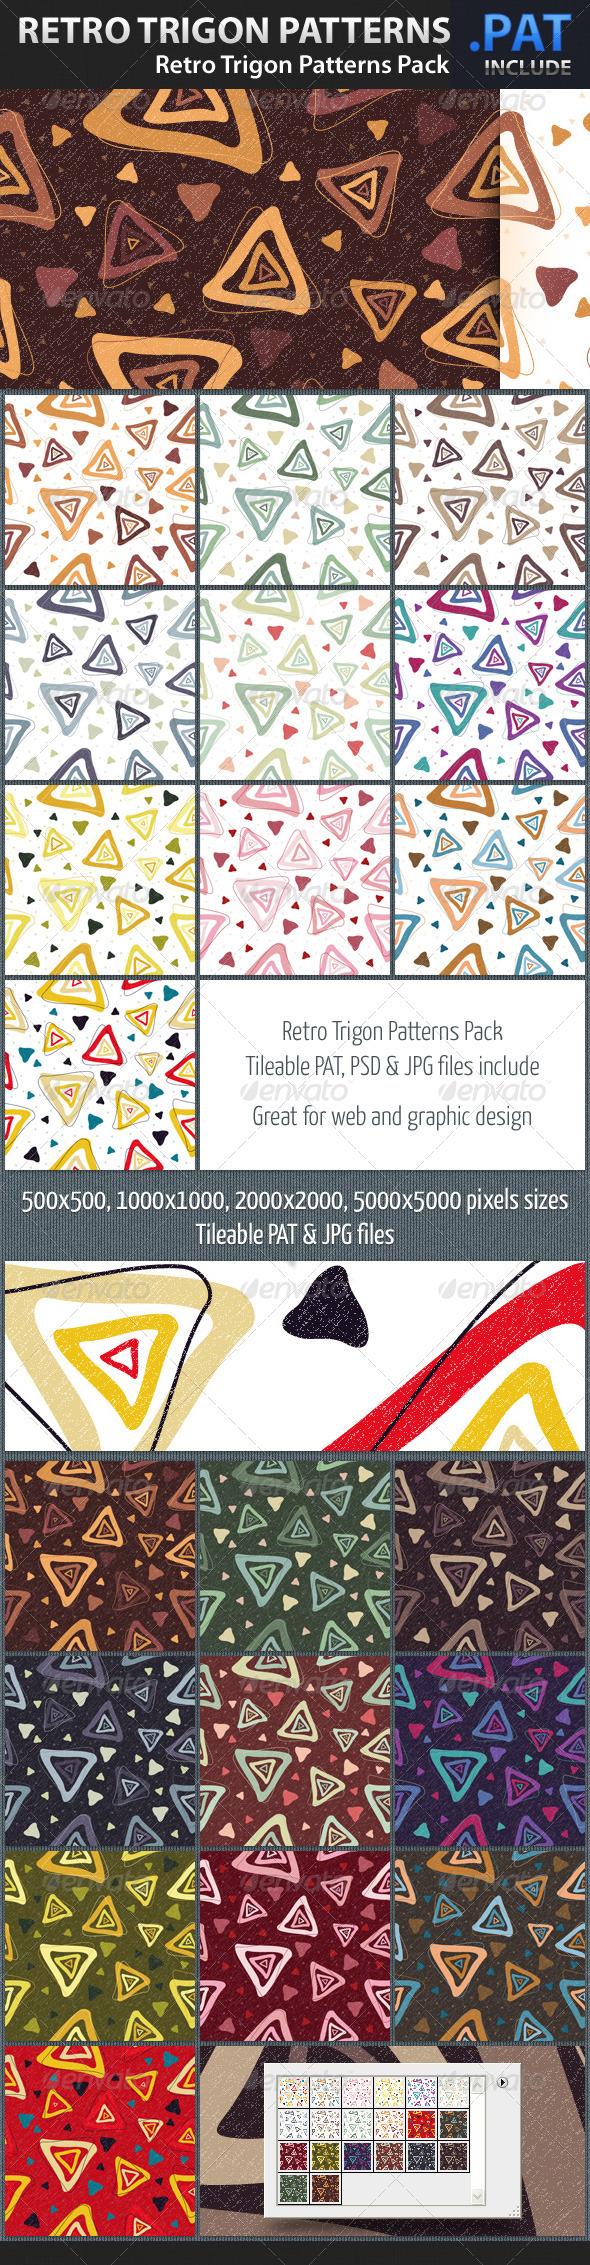 Retro Trigon Patterns Pack - Art Textures